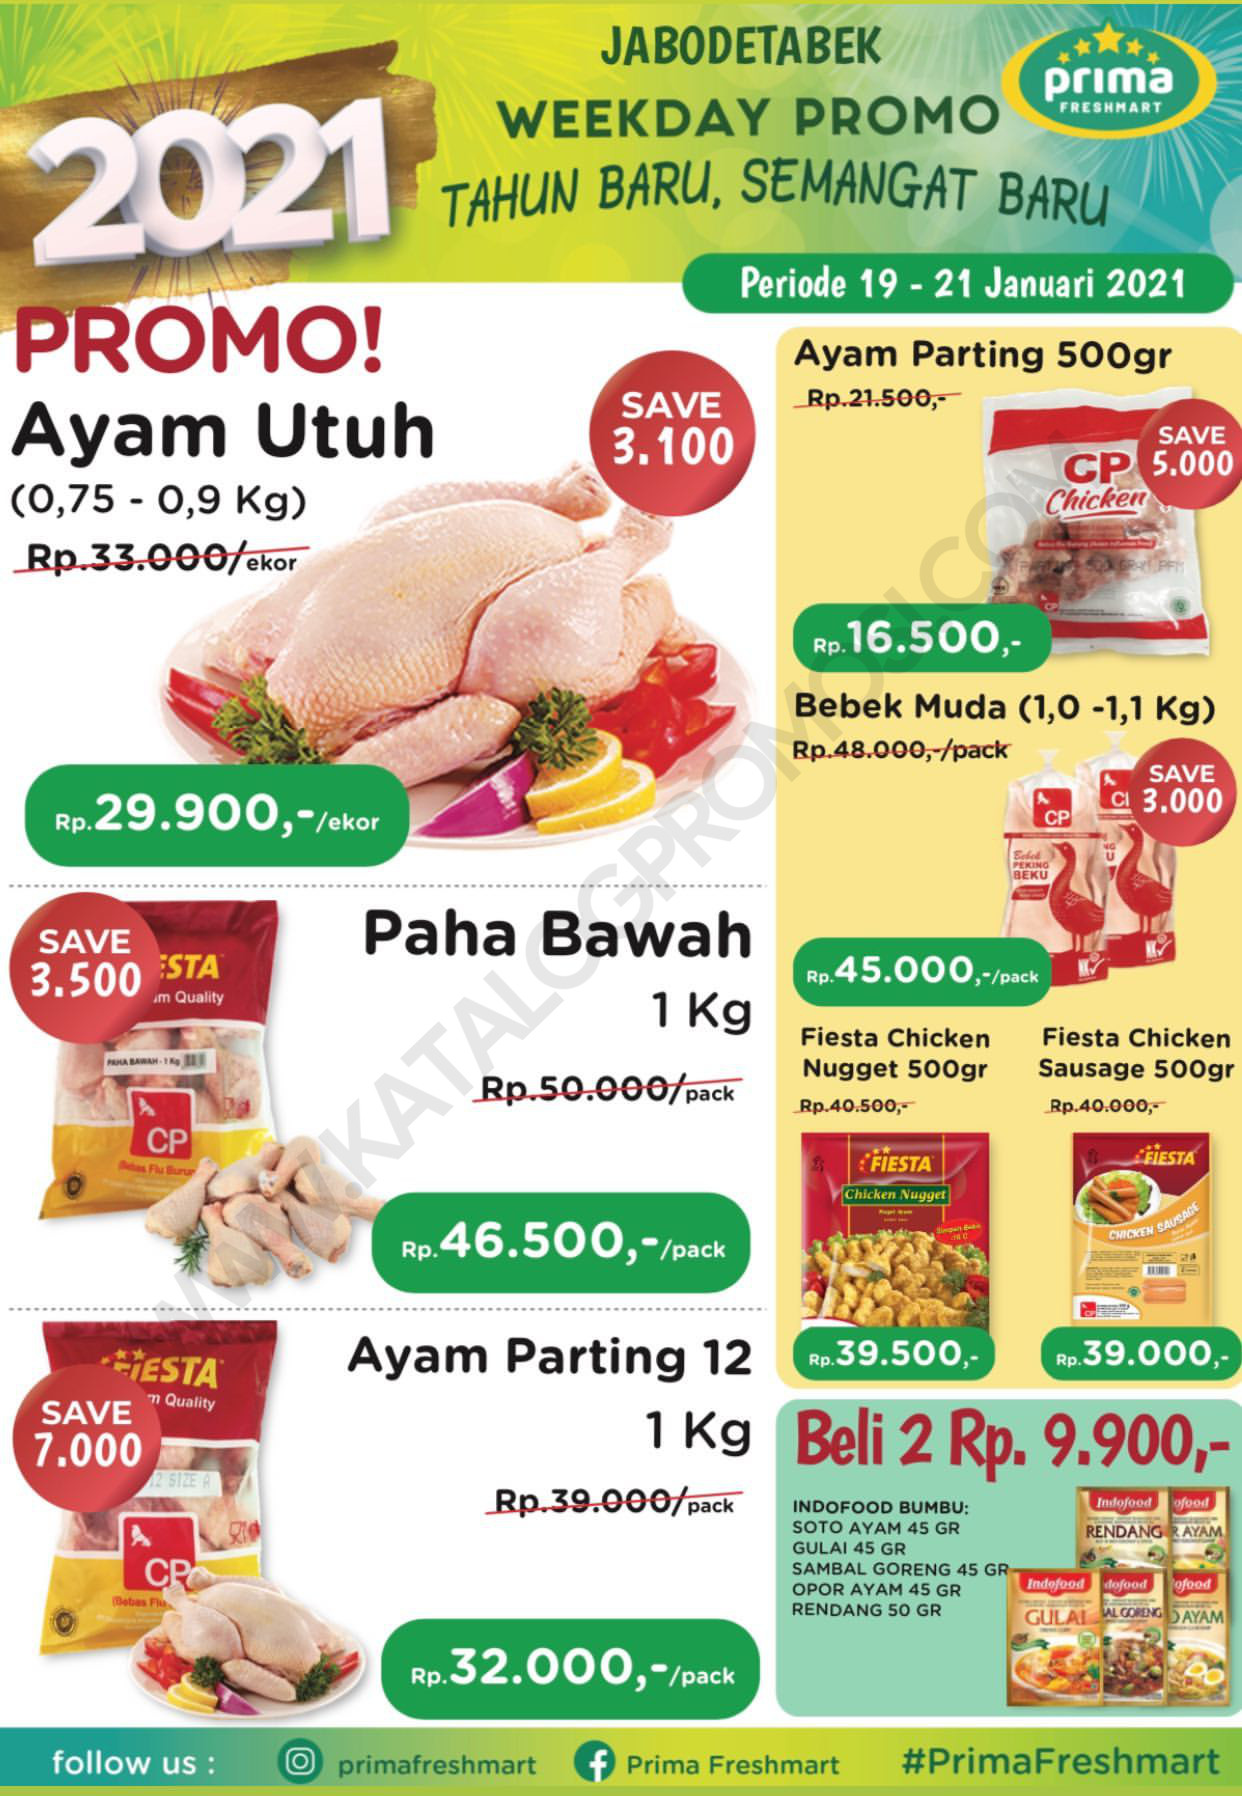 Promo Prima Freshmart Terbaru - Katalog Belanja Weekday periode 19-21 Januari 2021